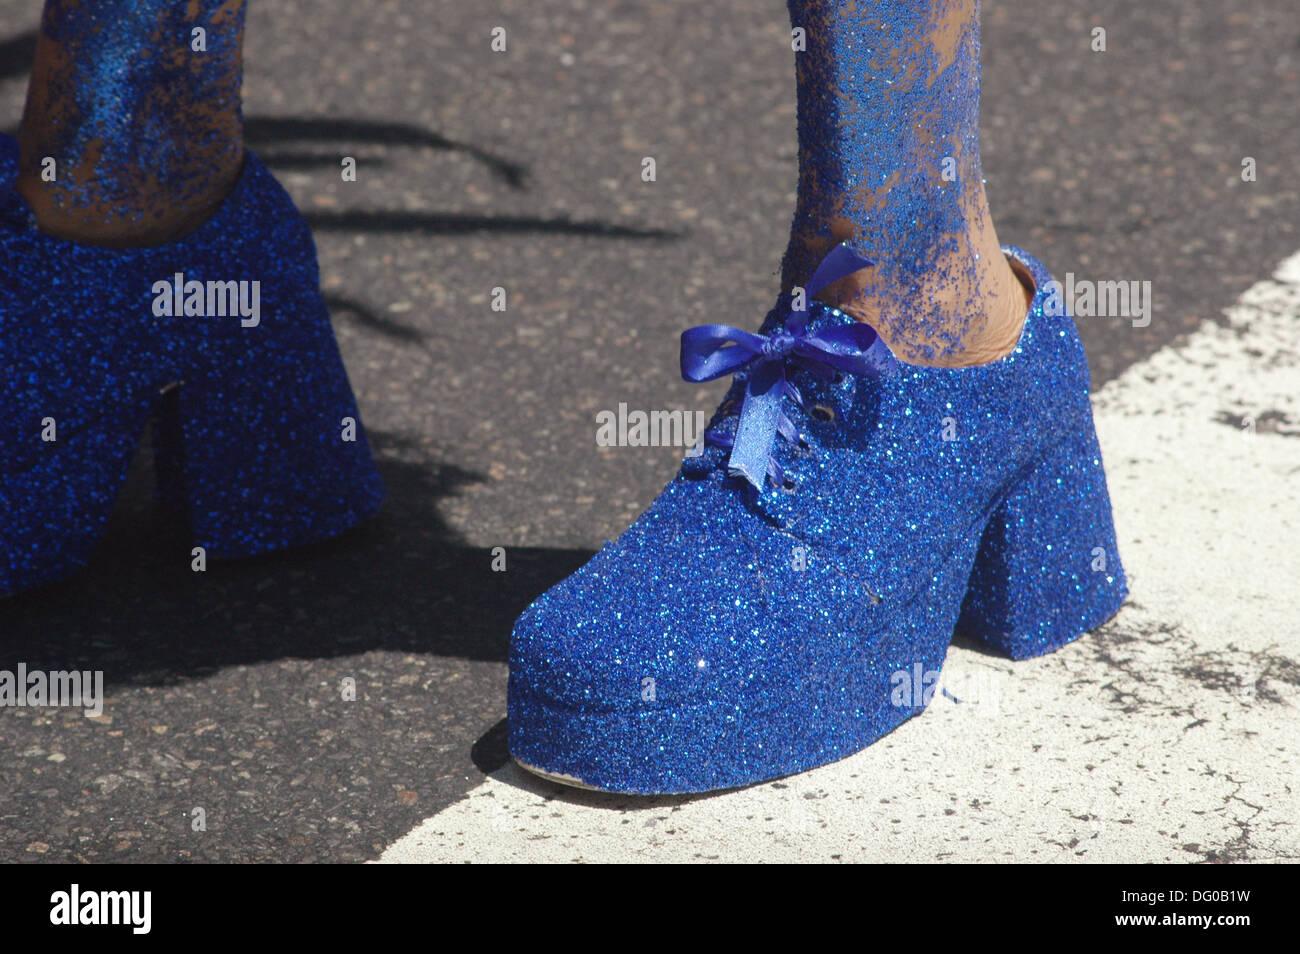 Lustige Schuhe Entlang Der 5th Avenue Stockfotos Lustige Schuhe